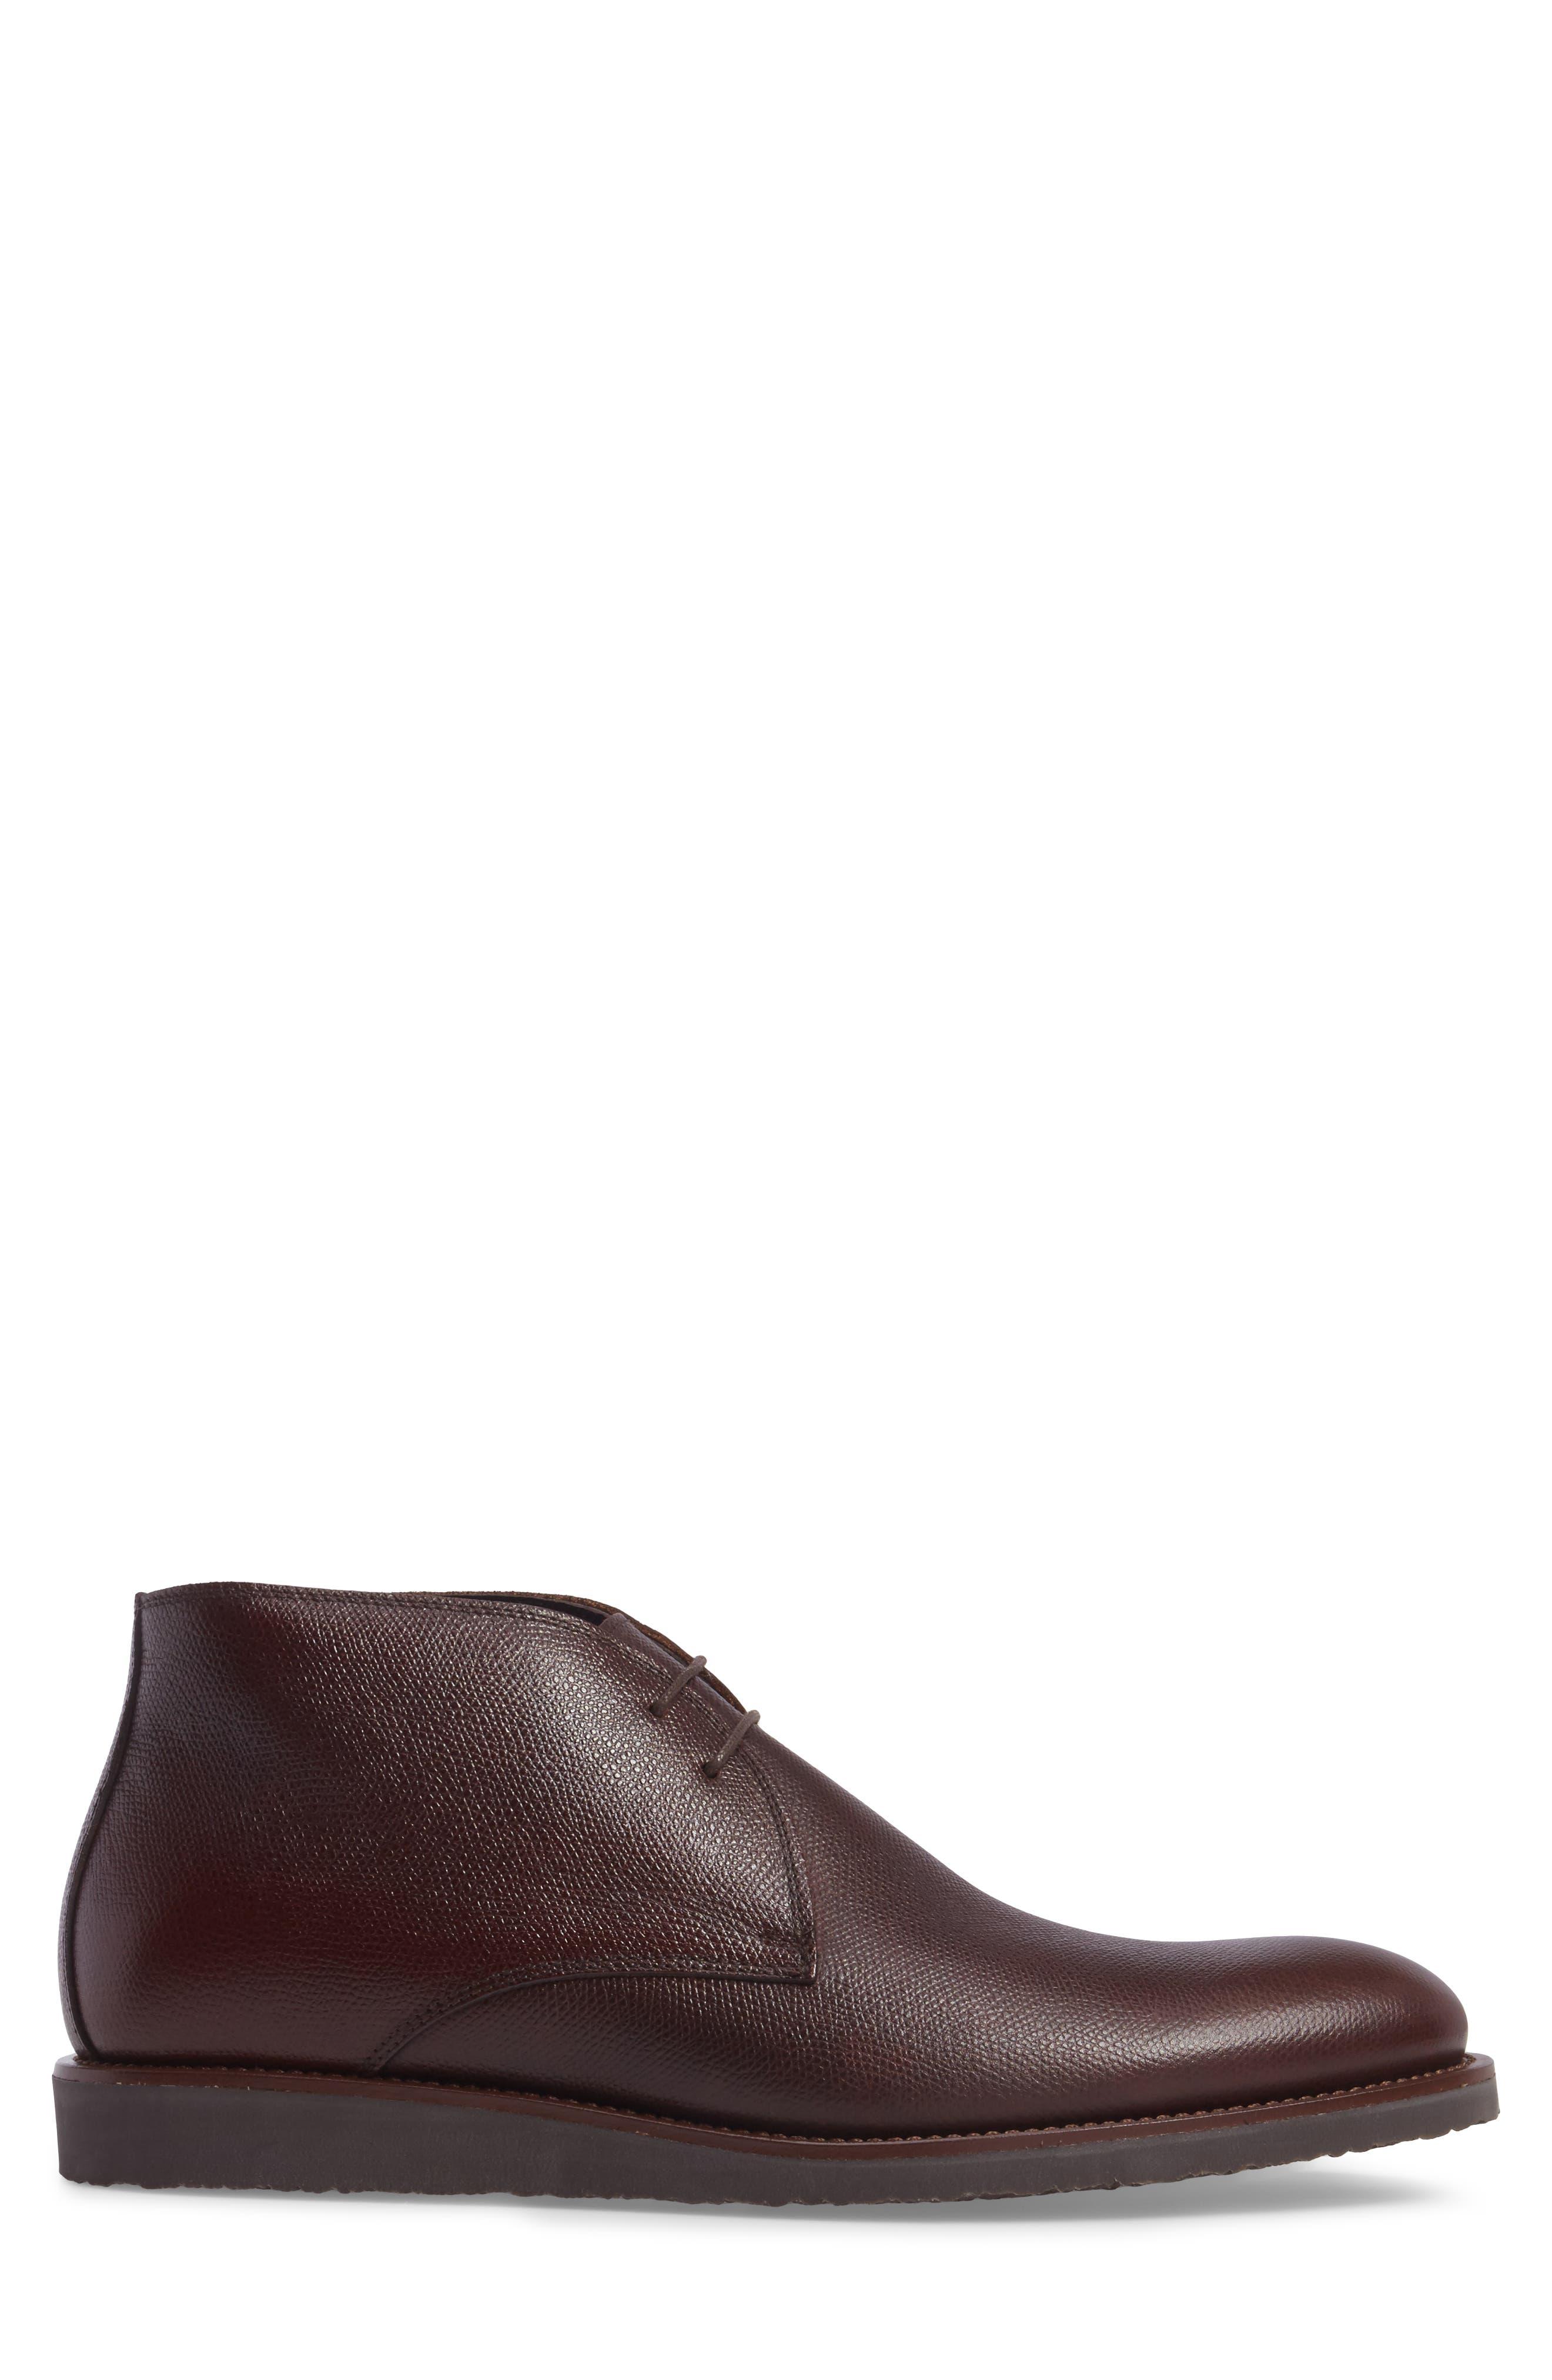 Alternate Image 3  - To Boot New York Franklin Chukka Boot (Men)